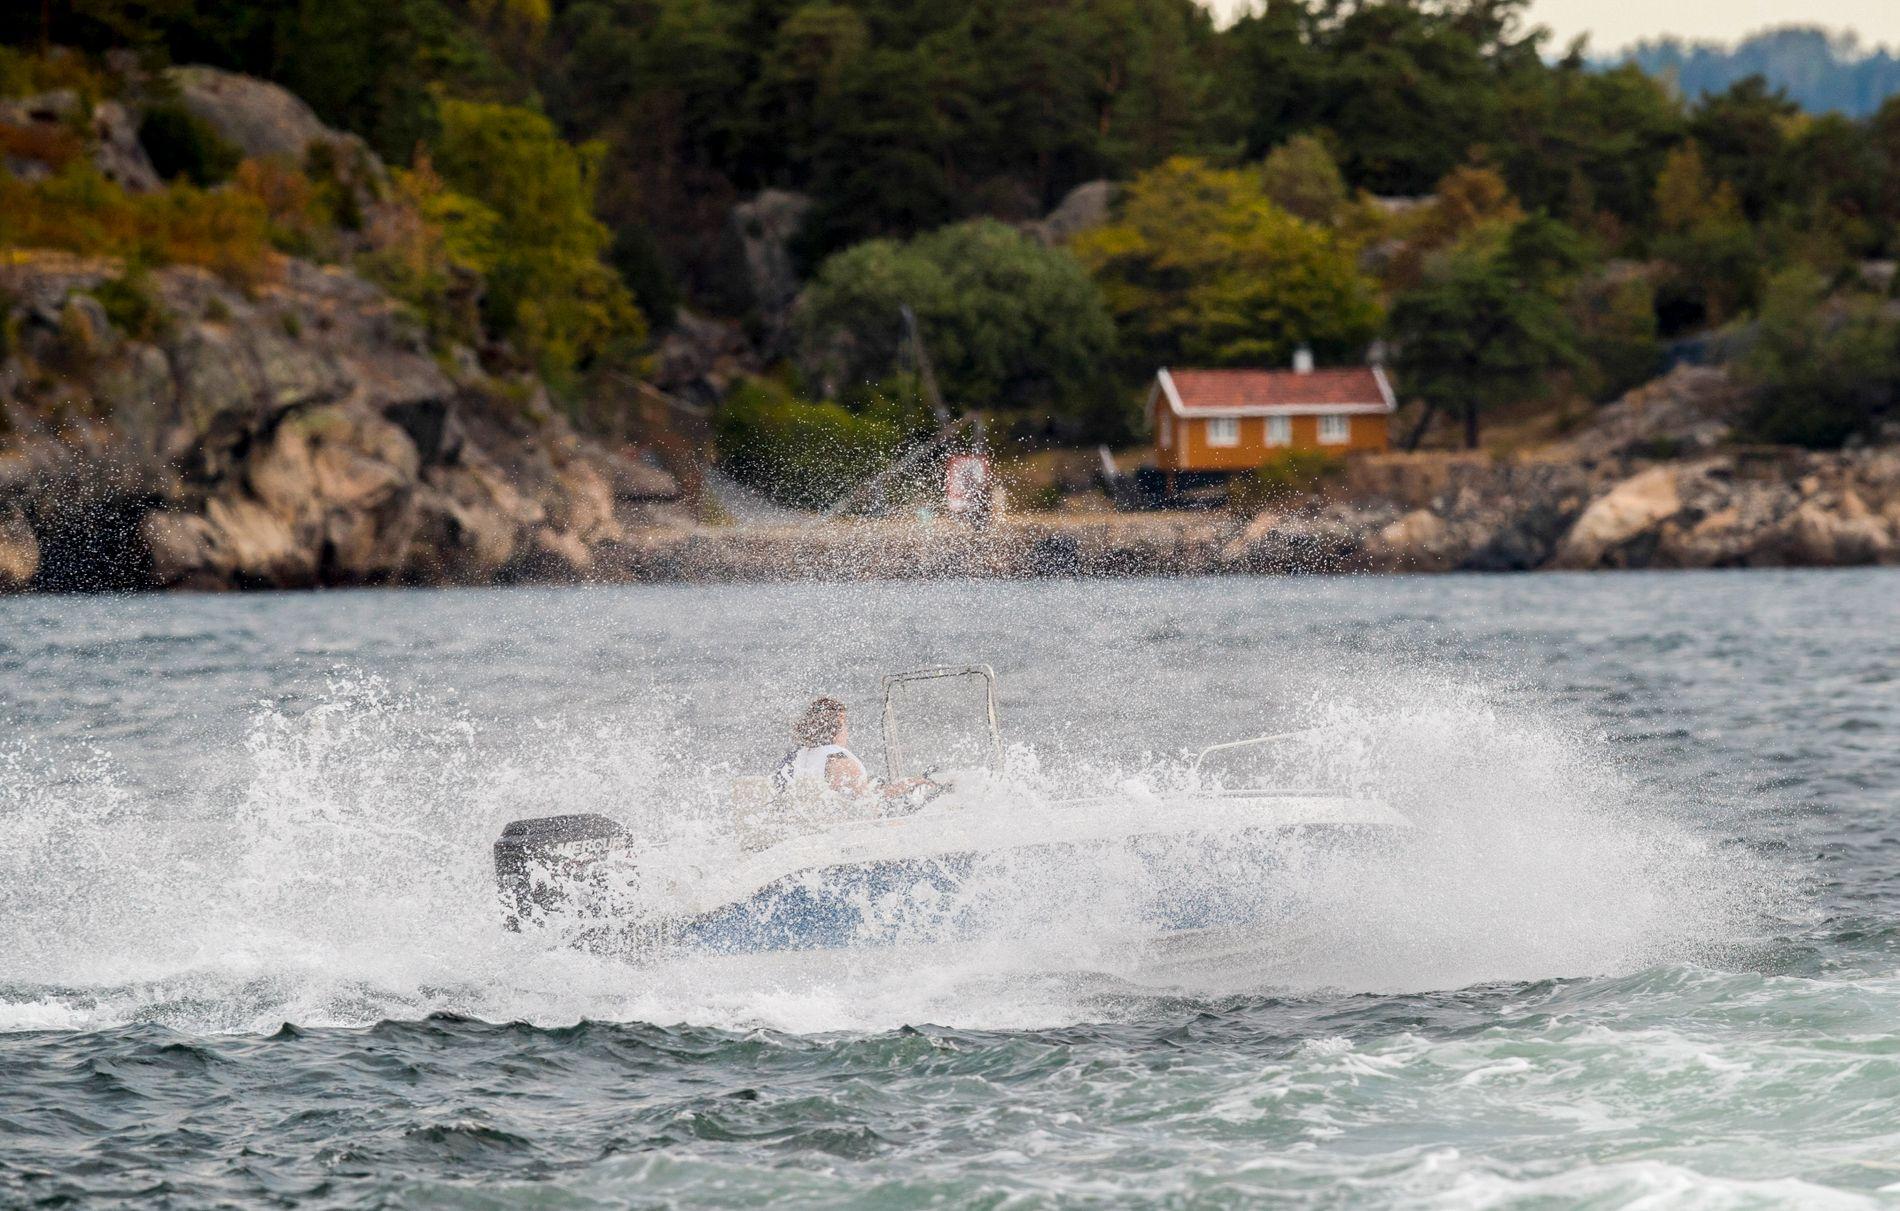 Rask båt med mye vannsprut Oslofjorden.